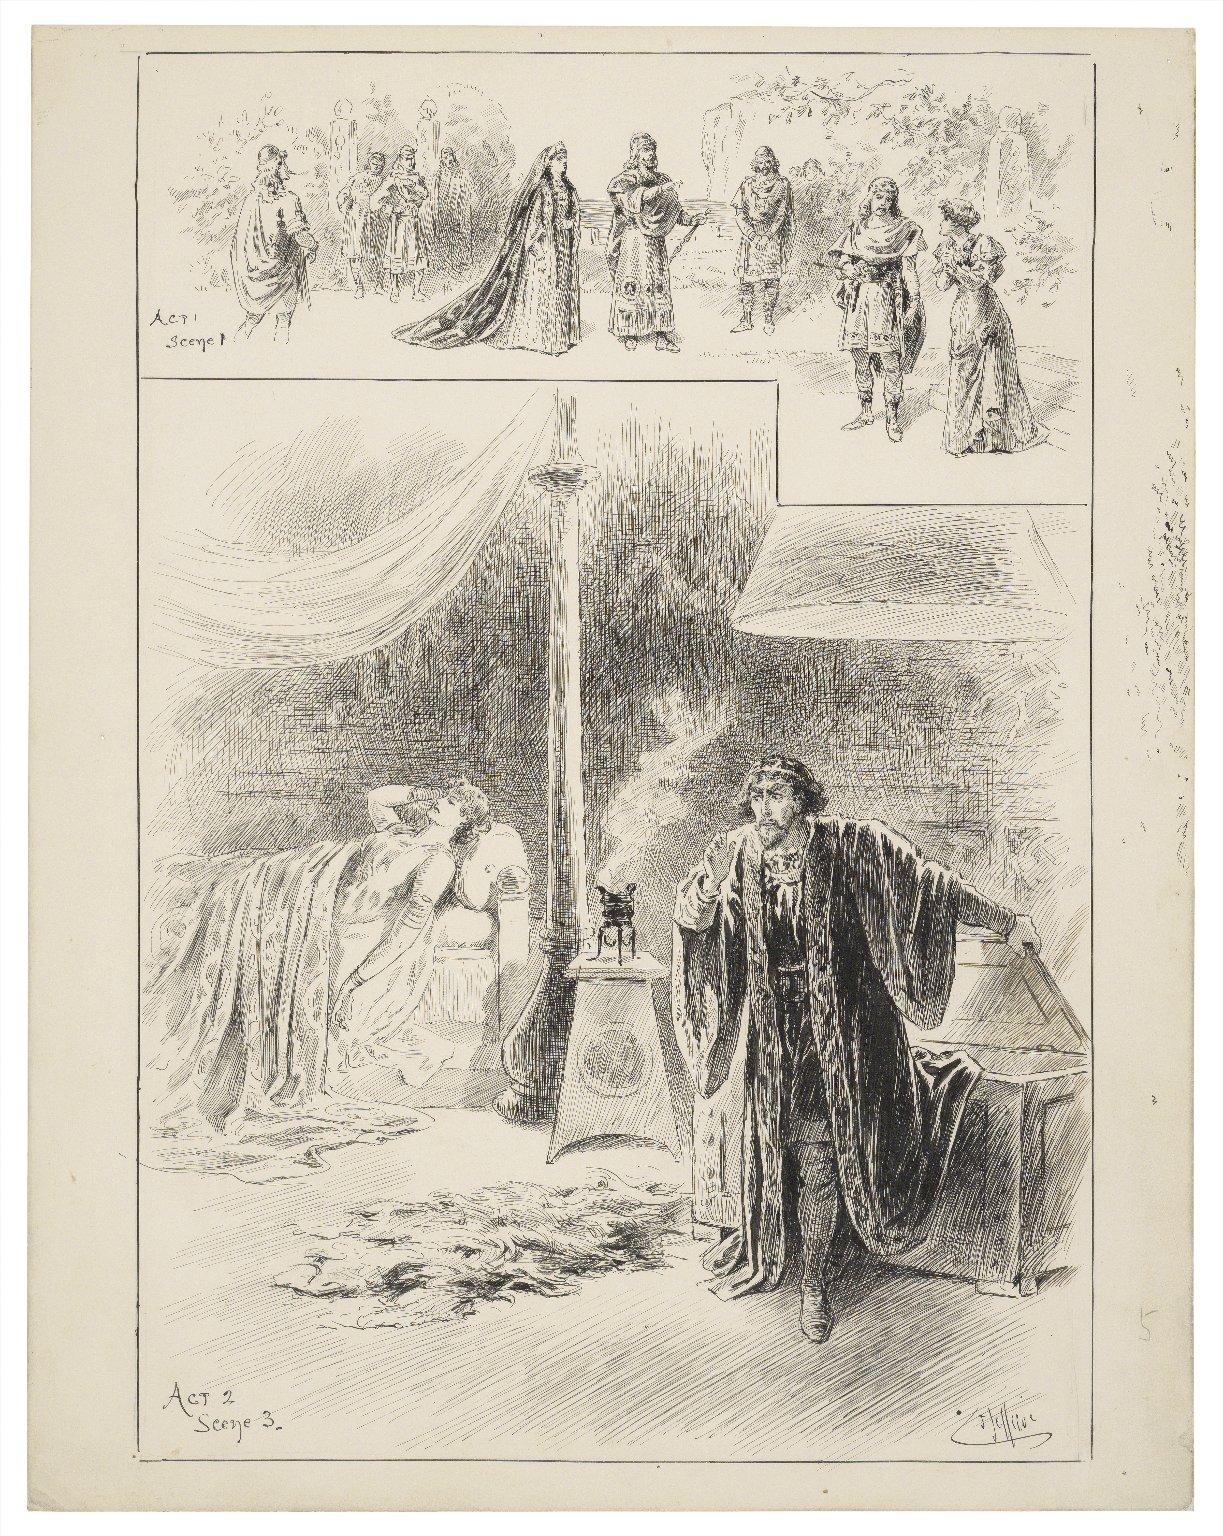 [Cymbeline, Miss Ellen Terry as Imogene, Mr. Henry Irving as Iachimo, Lyceum Theatre, September 26, 1896] [graphic] / J. Jellicoe.